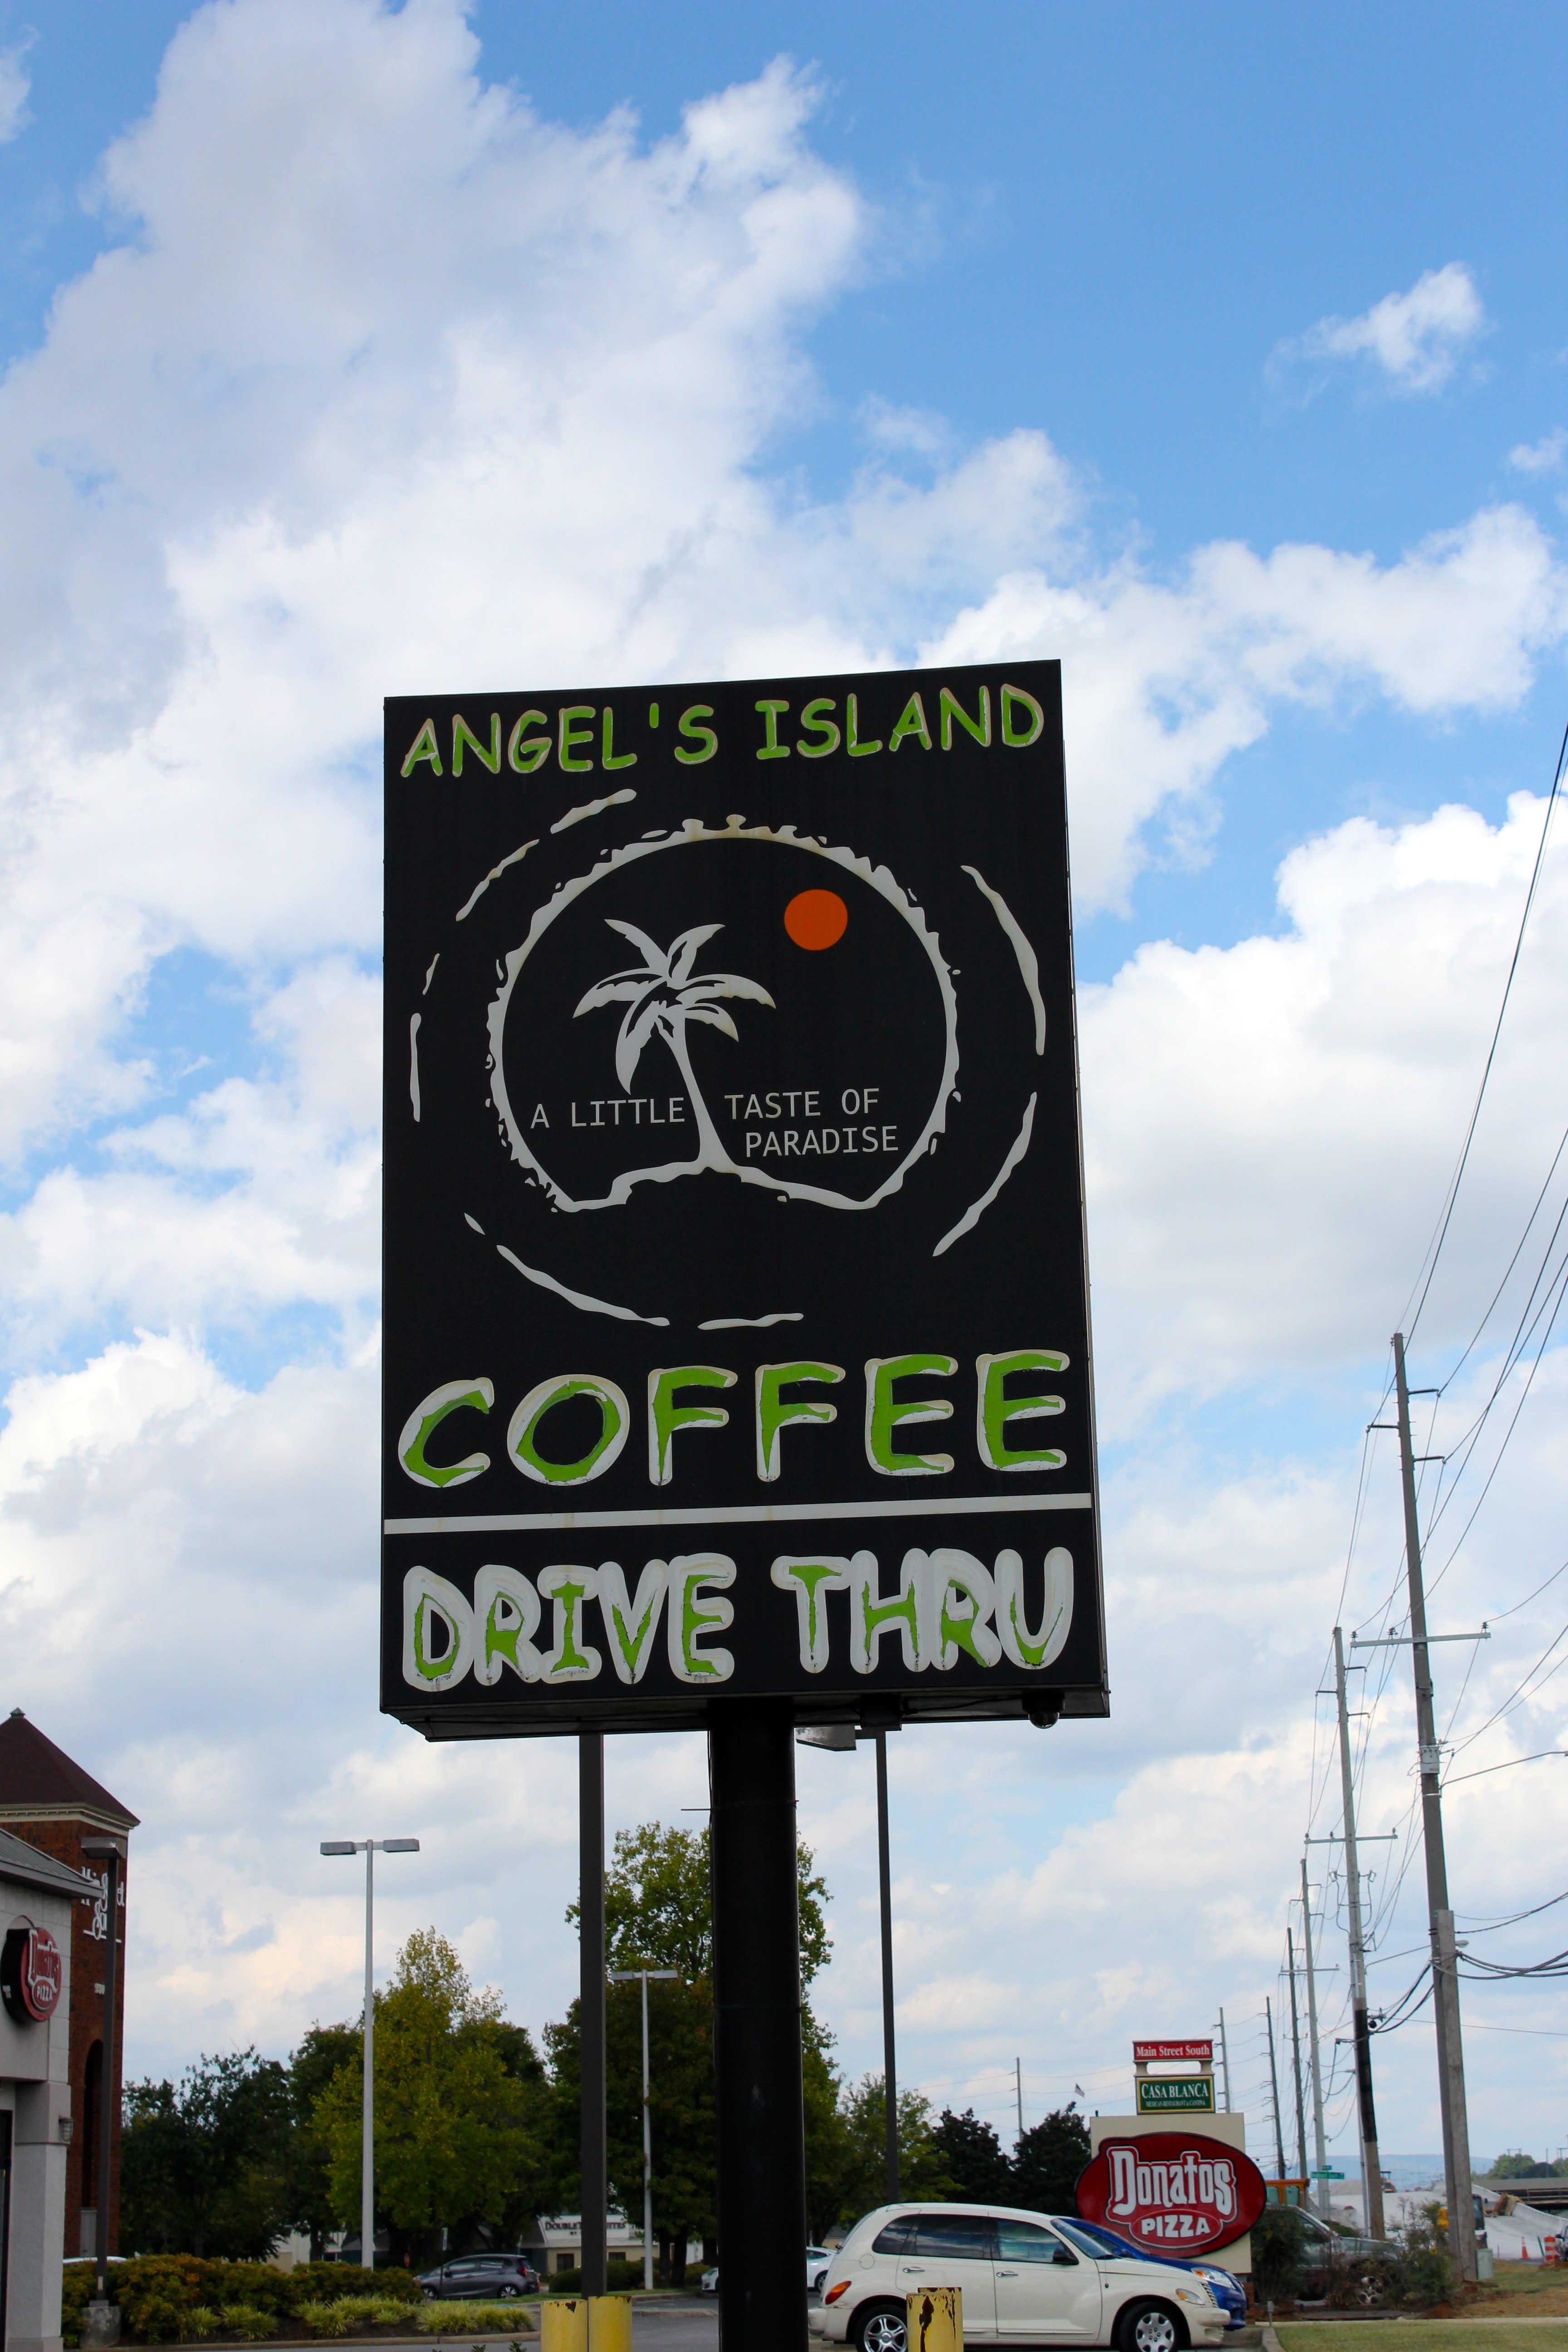 angels_island_1